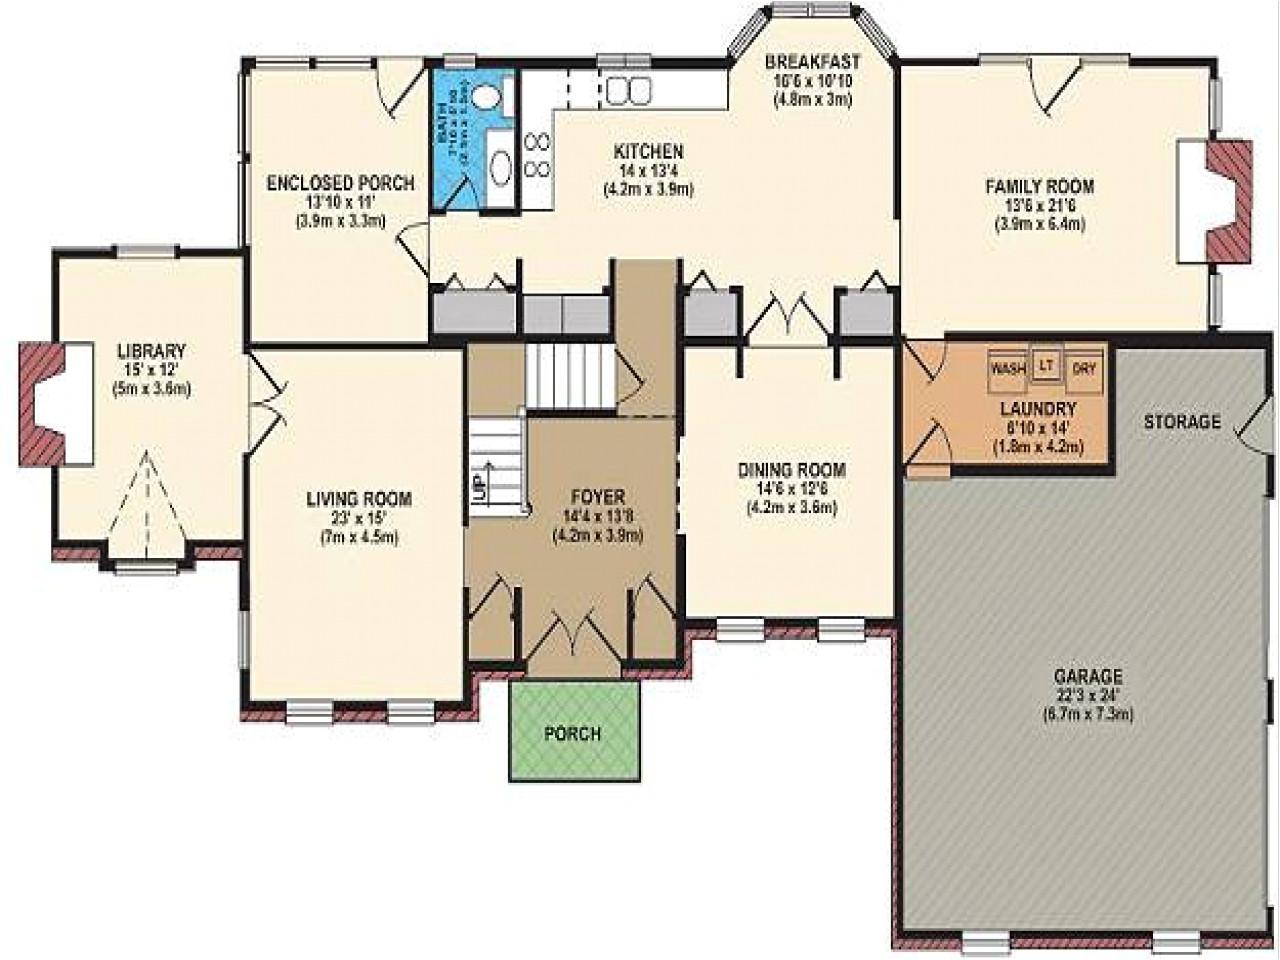 4a9b16299418d763 design your own floor plan free house floor plans